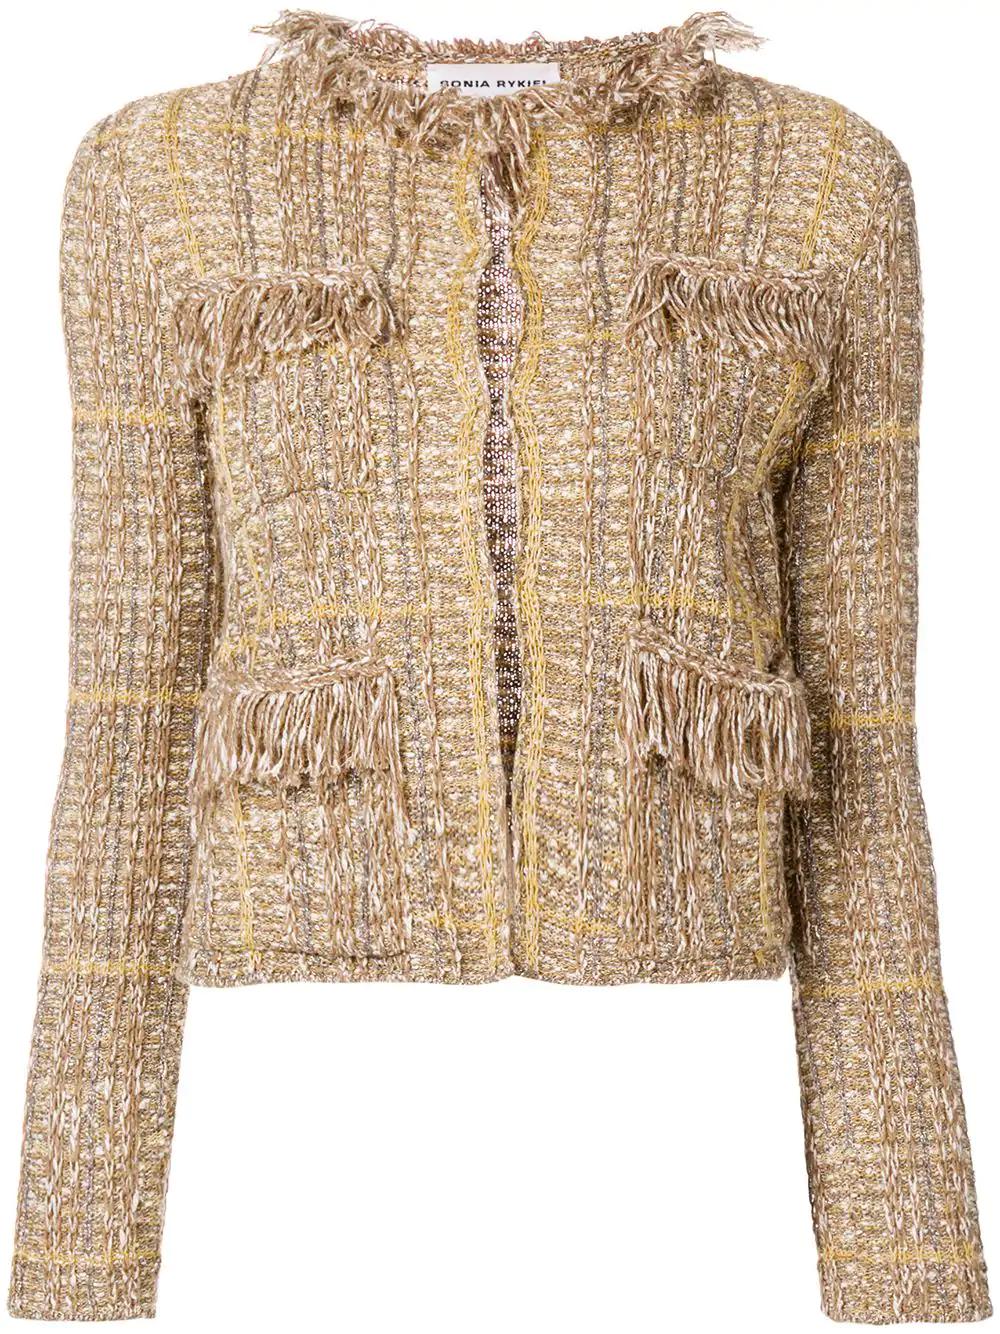 66ed55ad595 Sonia Rykiel Tweed Jacket - Neutrals | ModeSens